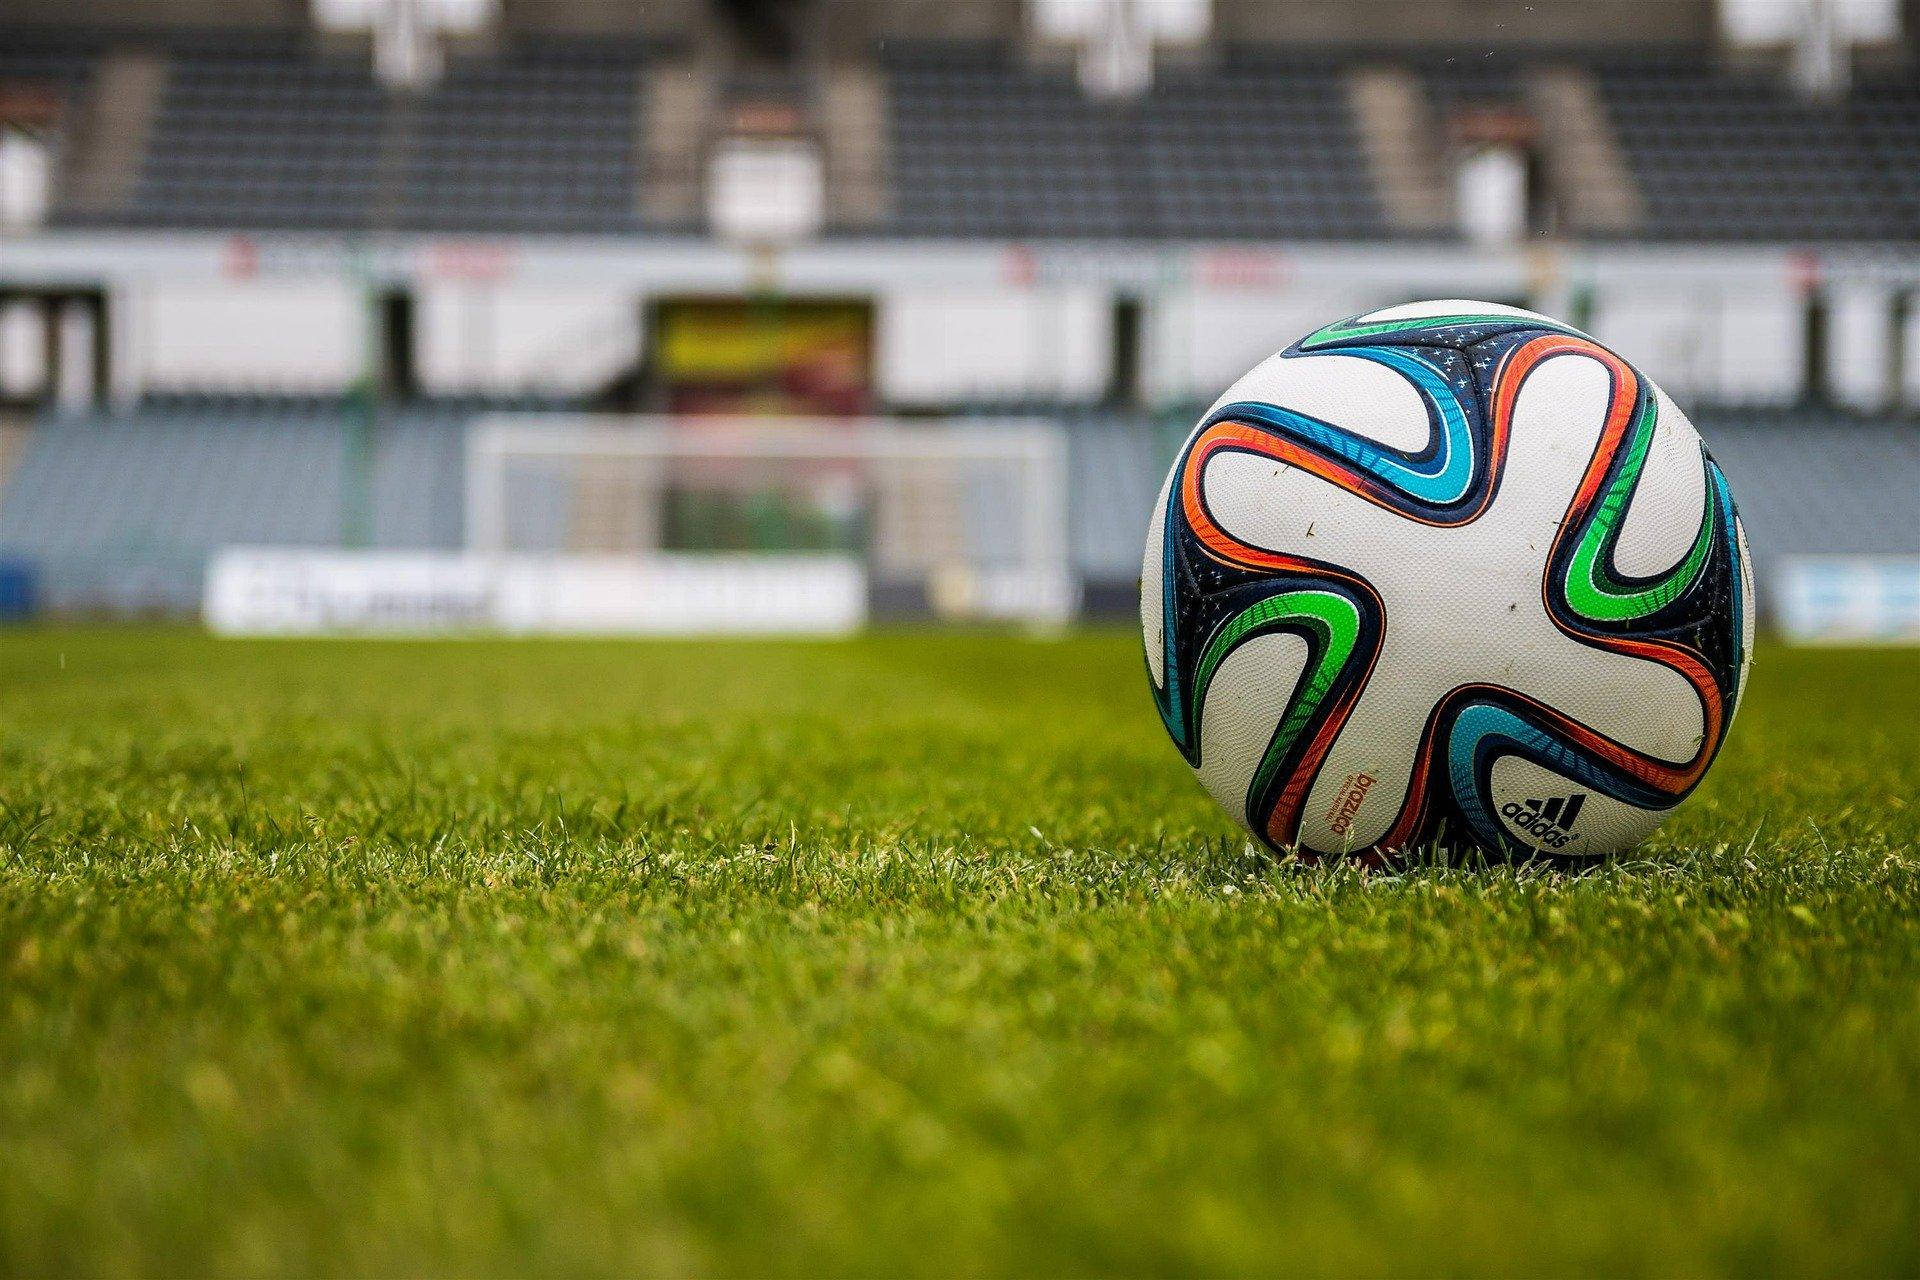 fußball_stadion_rasen_grün_ball_adidas